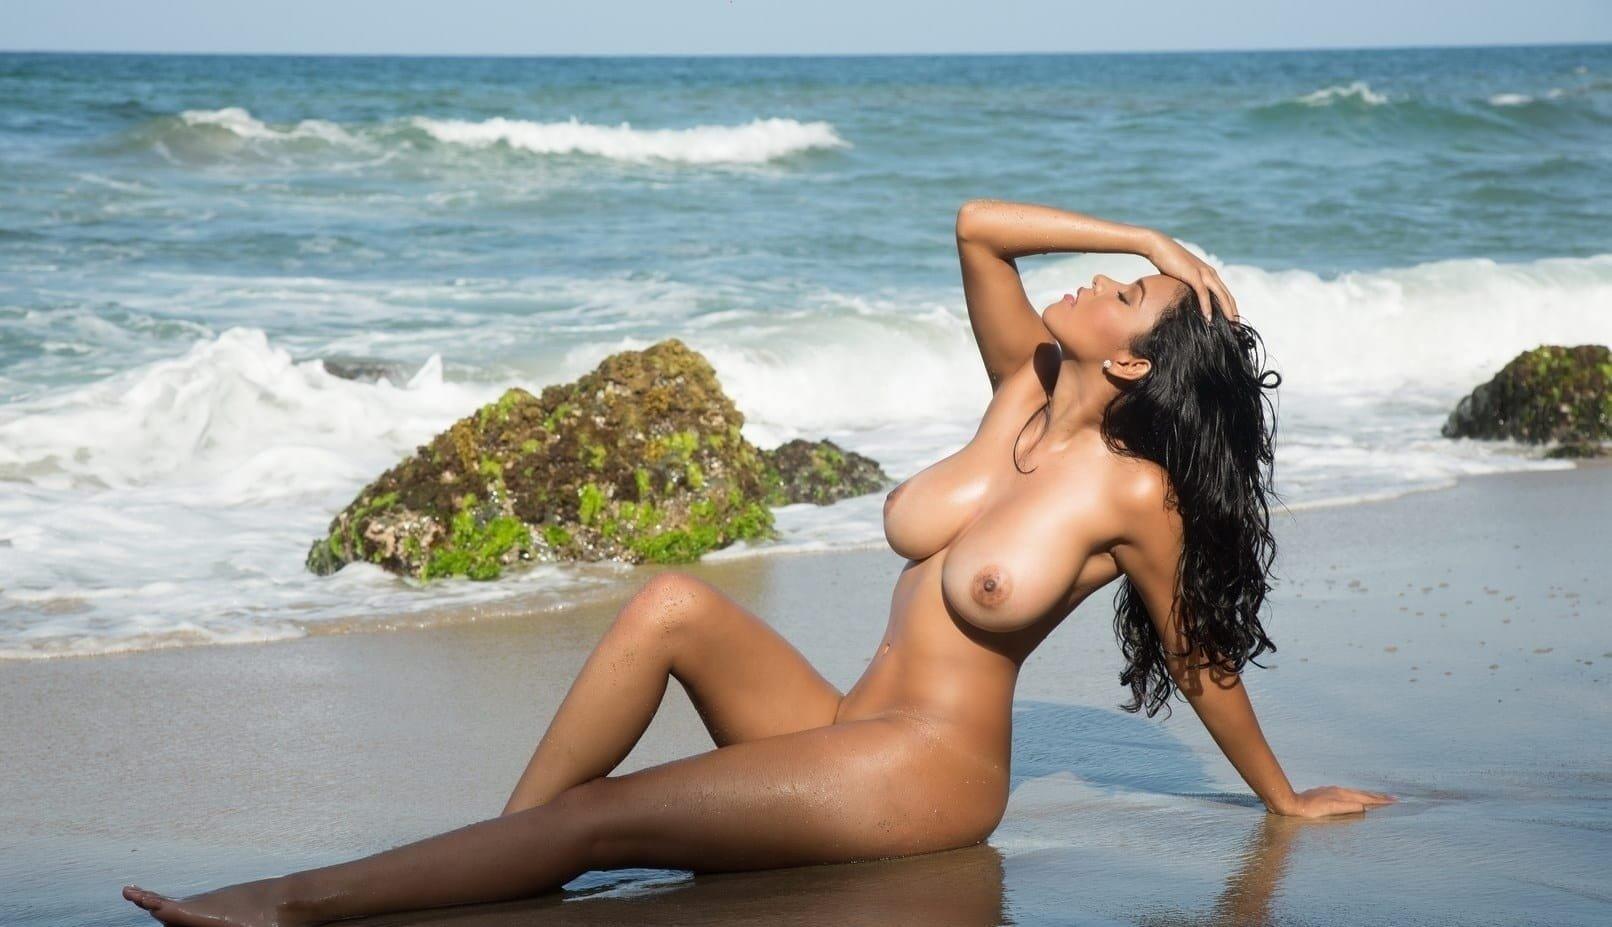 Topless women on the beach